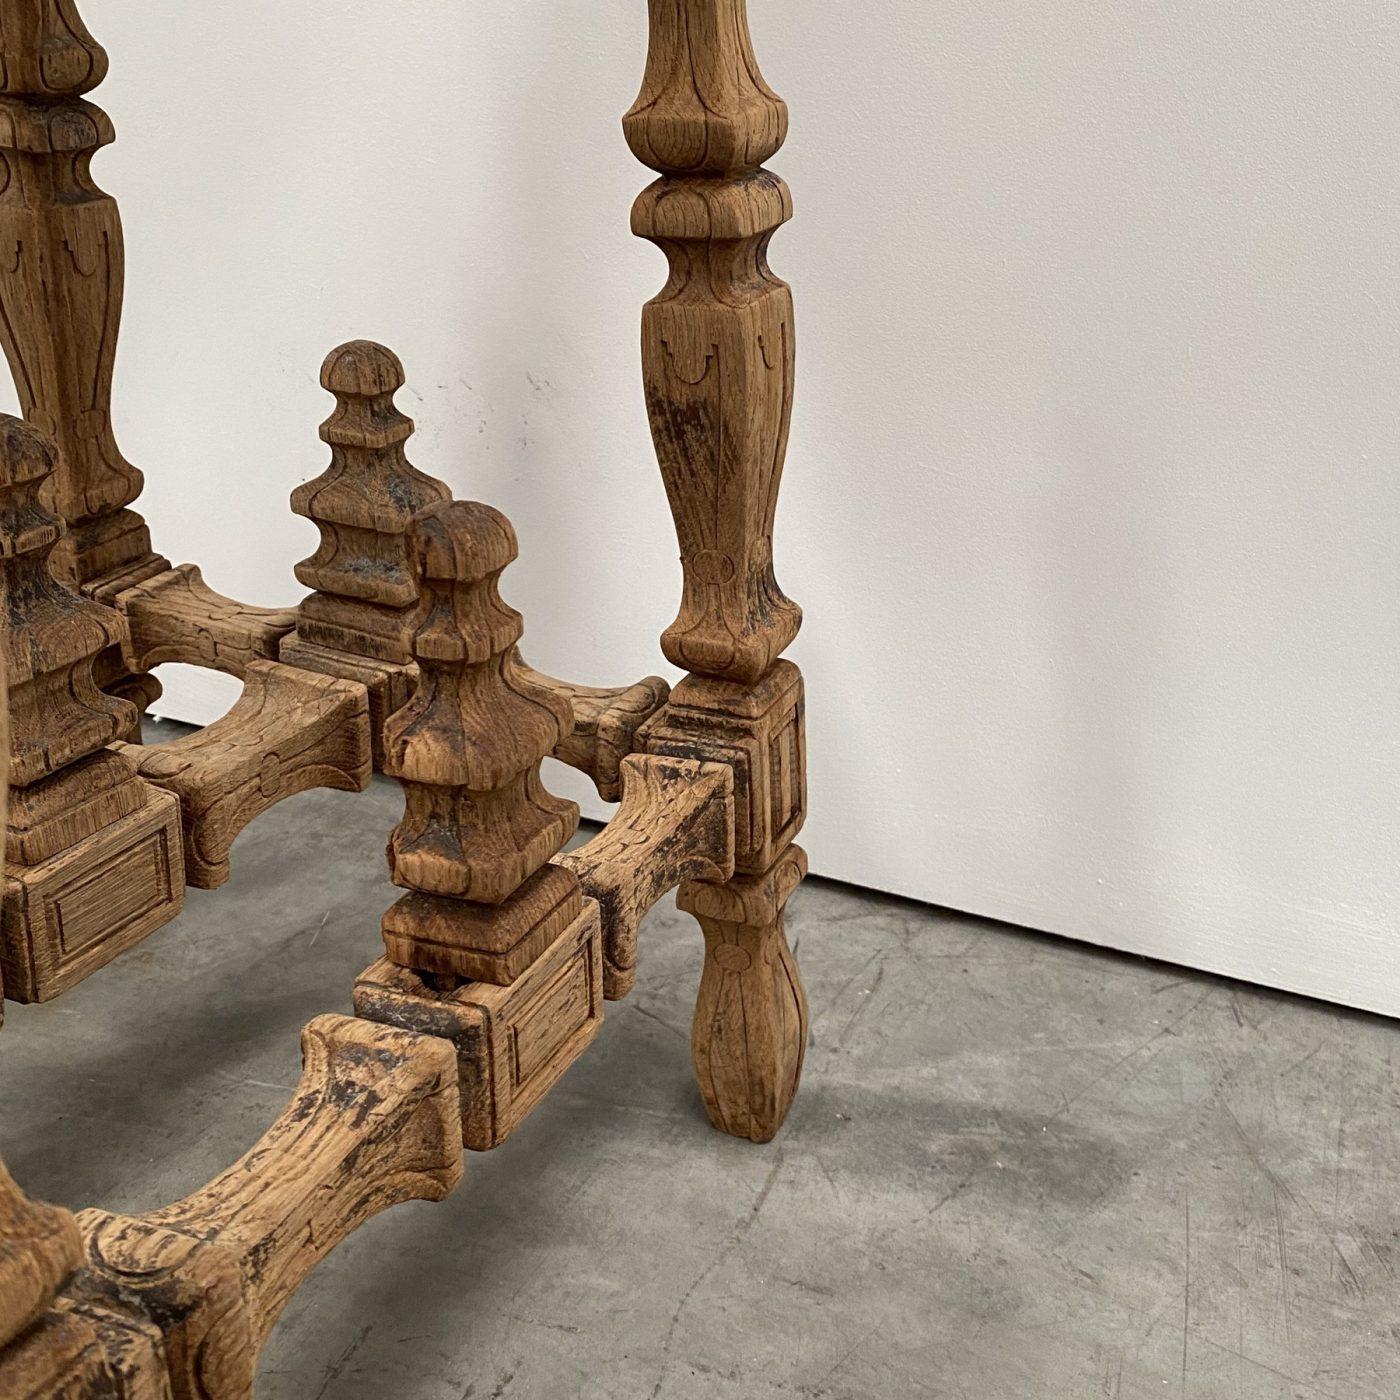 objet-vagabond-sculptor-table0001